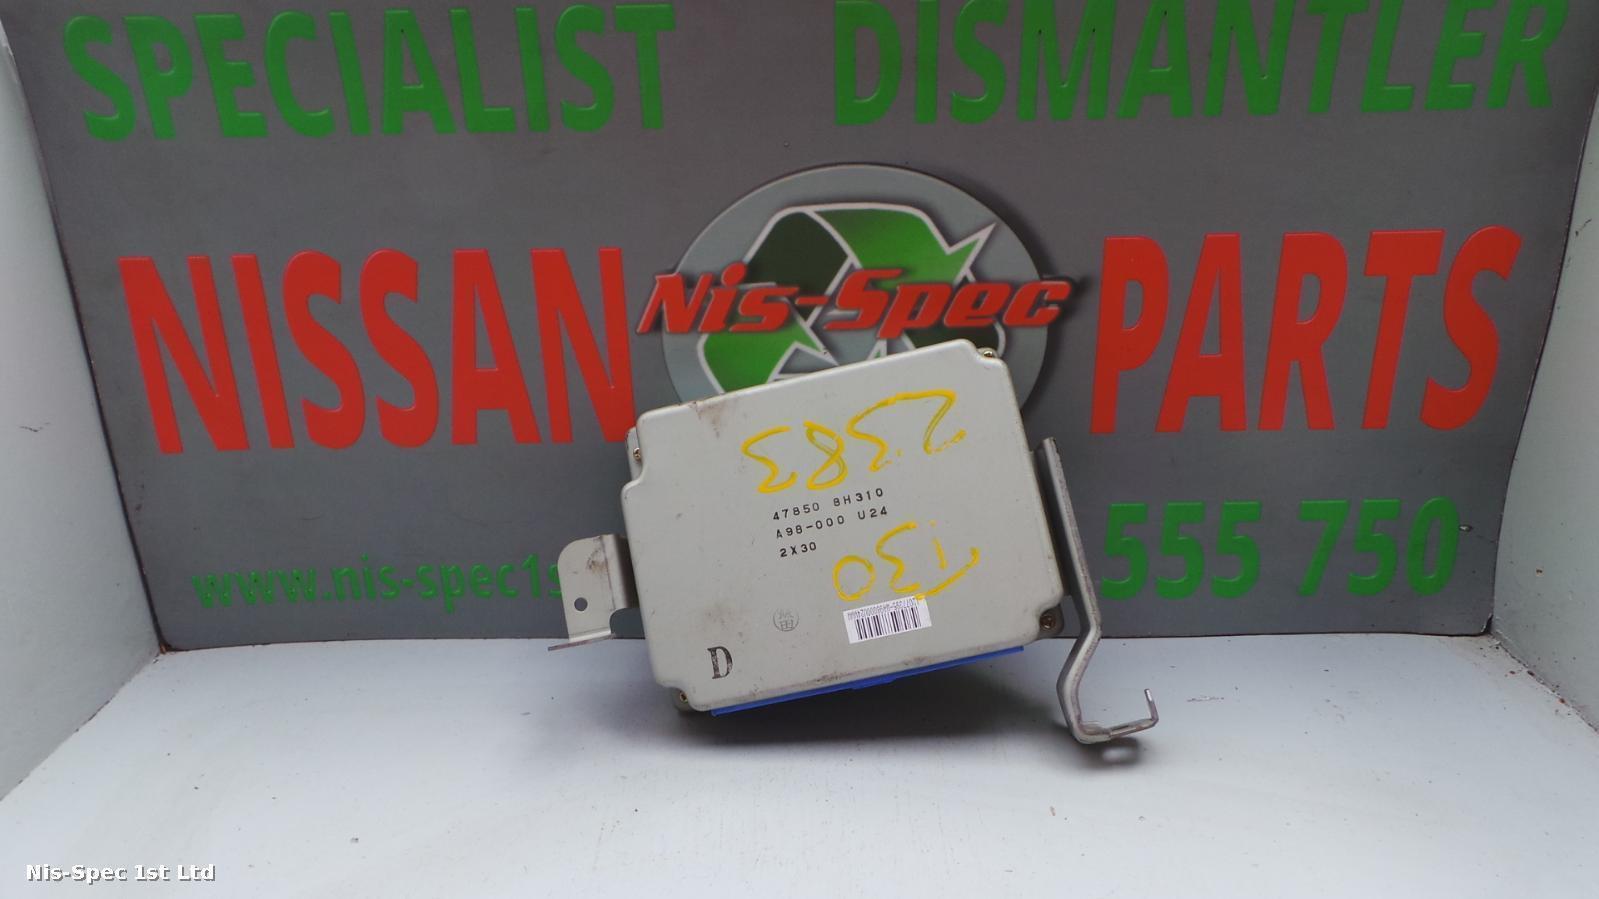 X TRAIL ABS ECU T30 01-06 PART NUMBER 47850 8H310